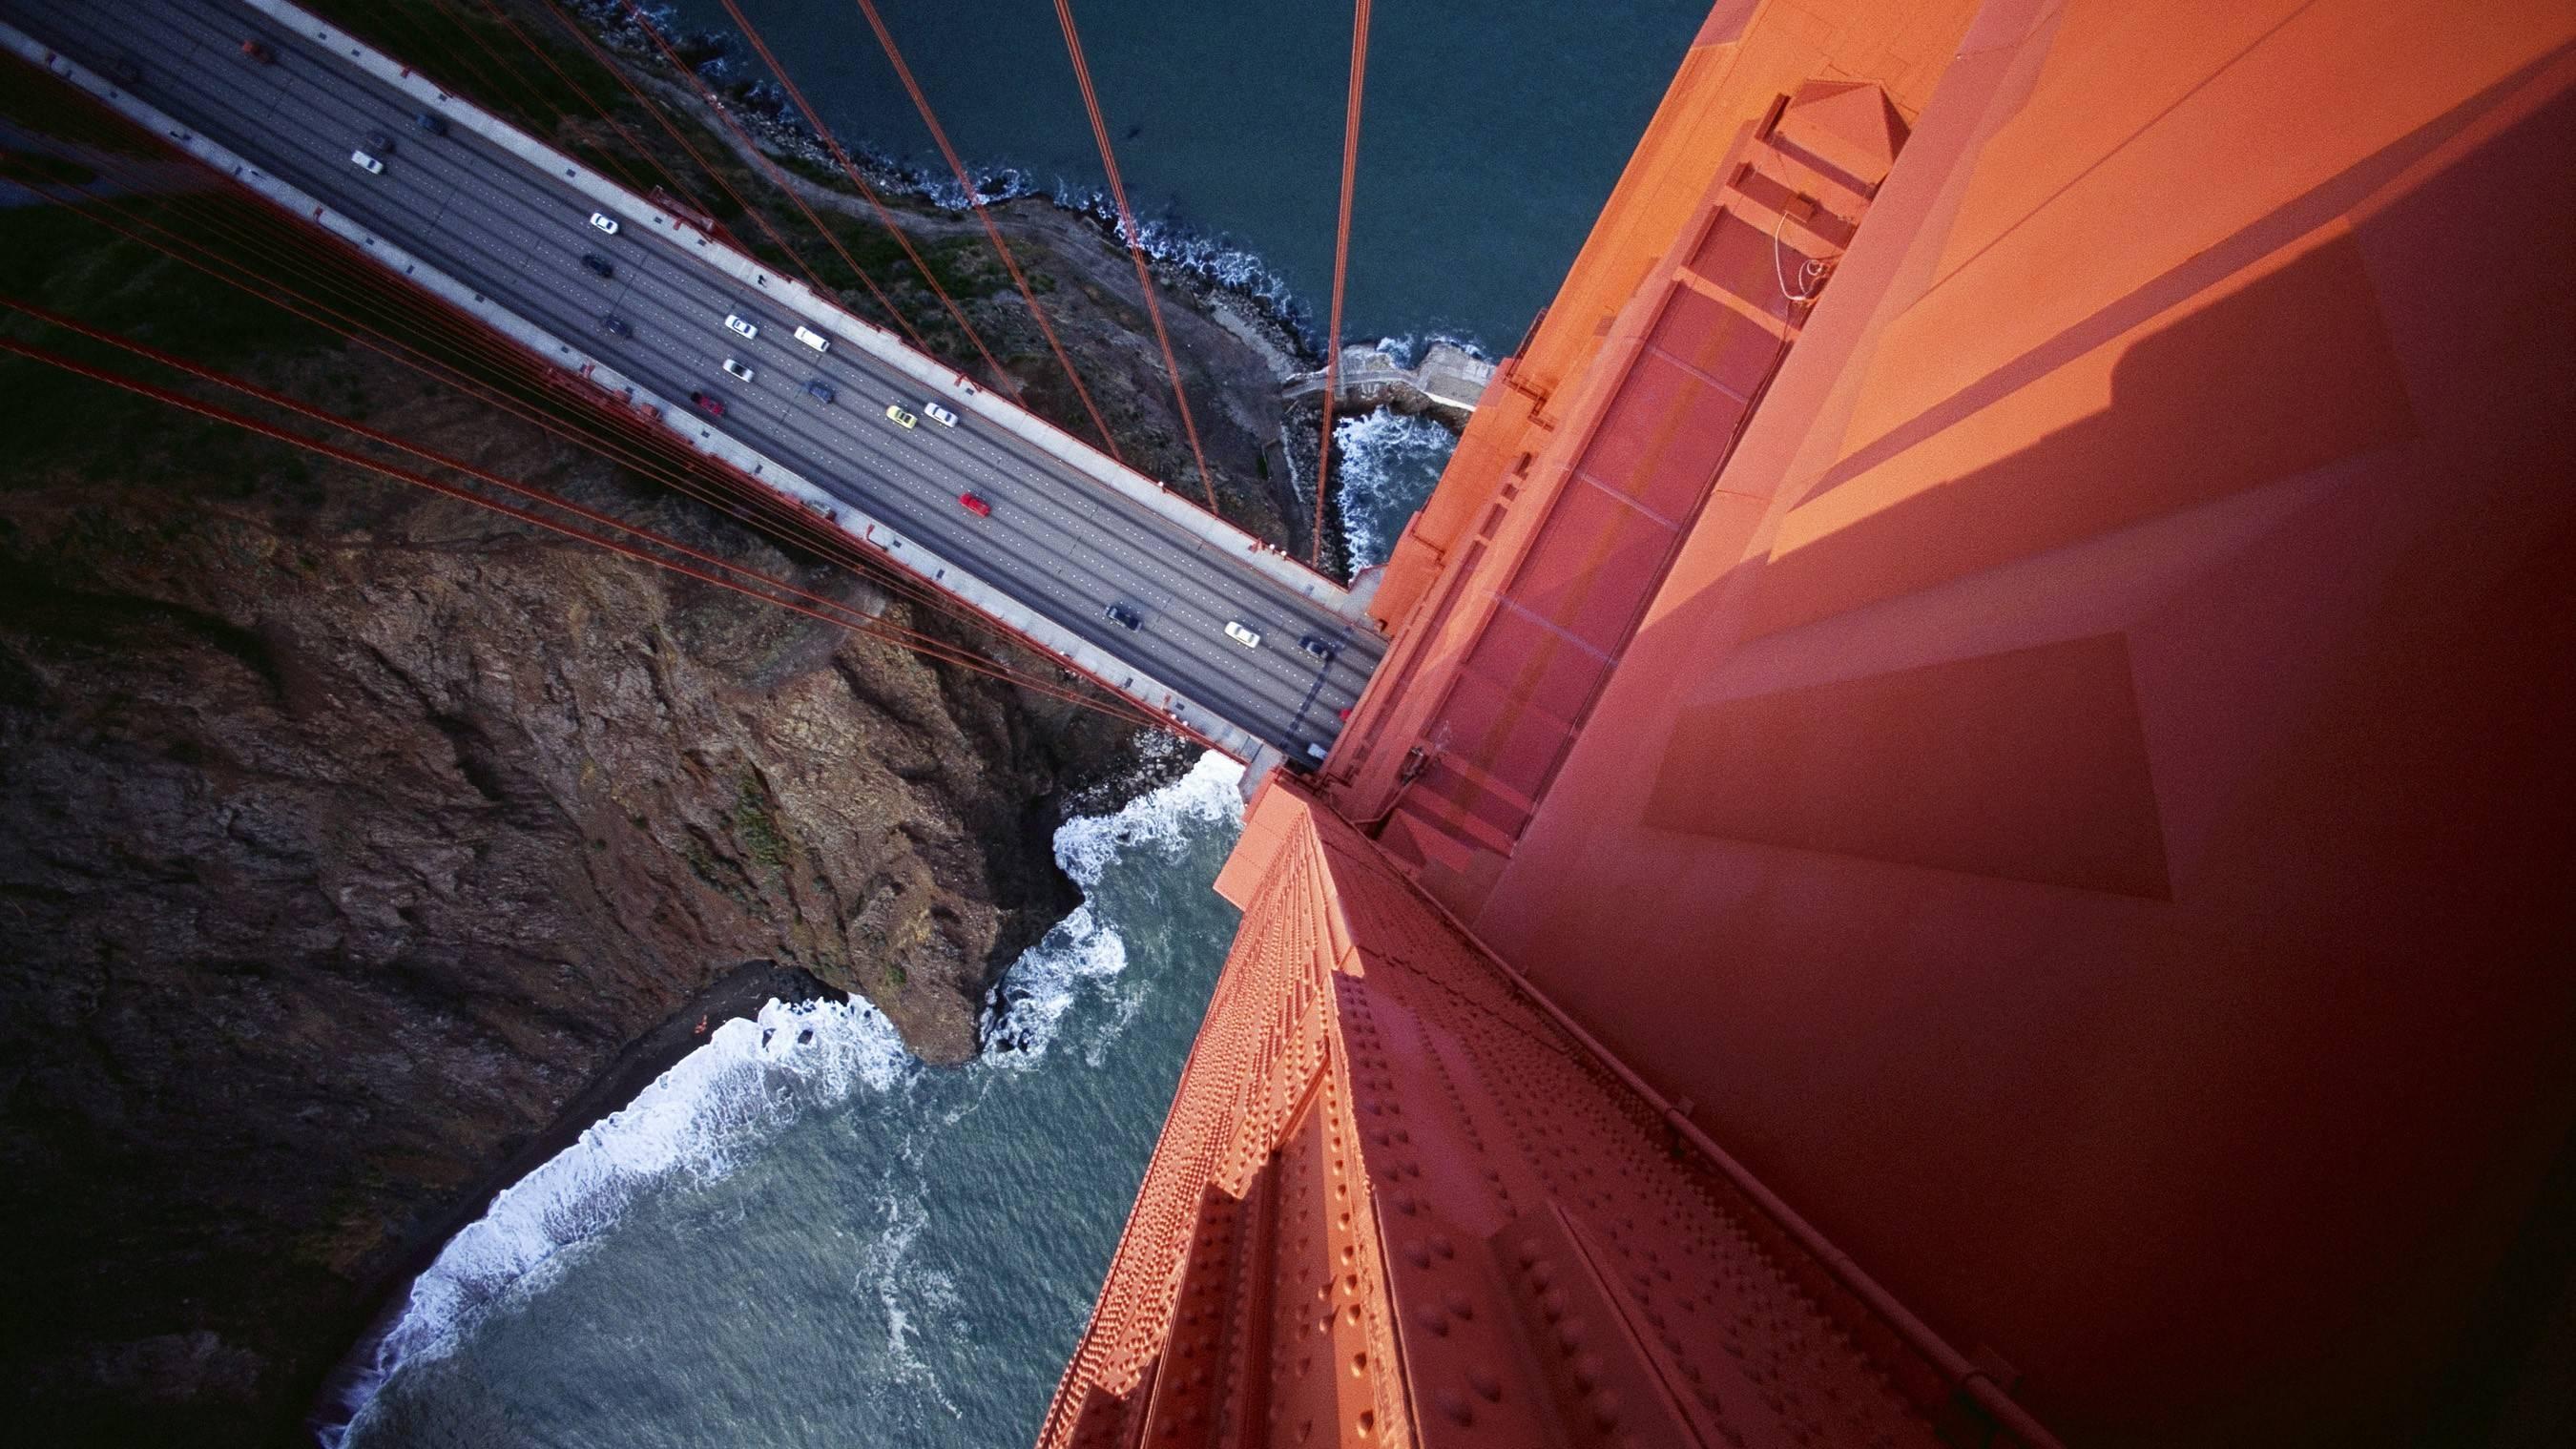 Golden Gate Bridge Wallpapers | HD Wallpapers Again